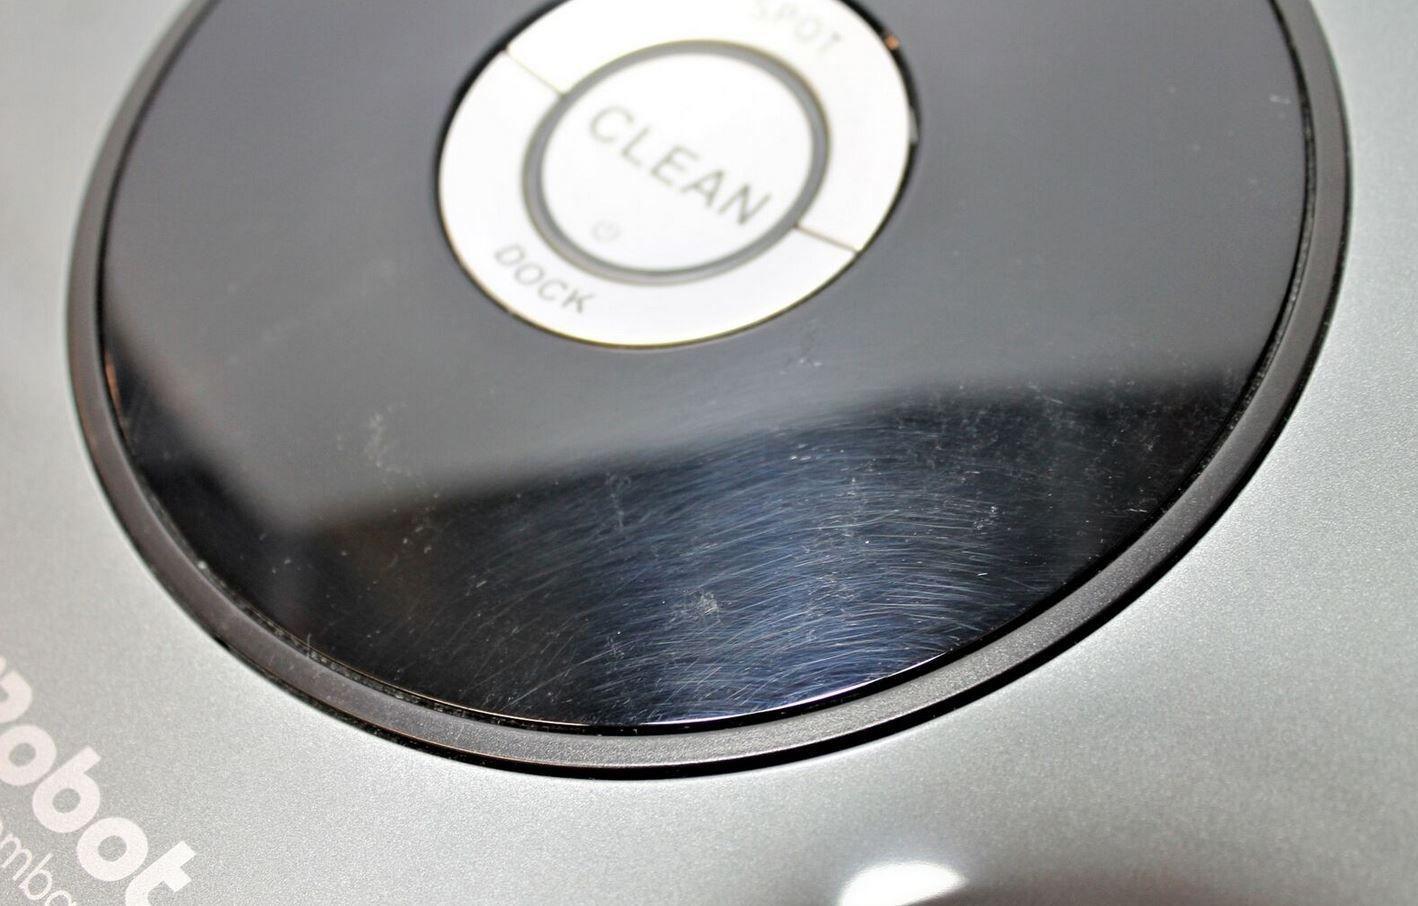 IROBOT Roomba 676 Staubsaugroboter für 109,95€ (statt neu 209€)   Gebraucht